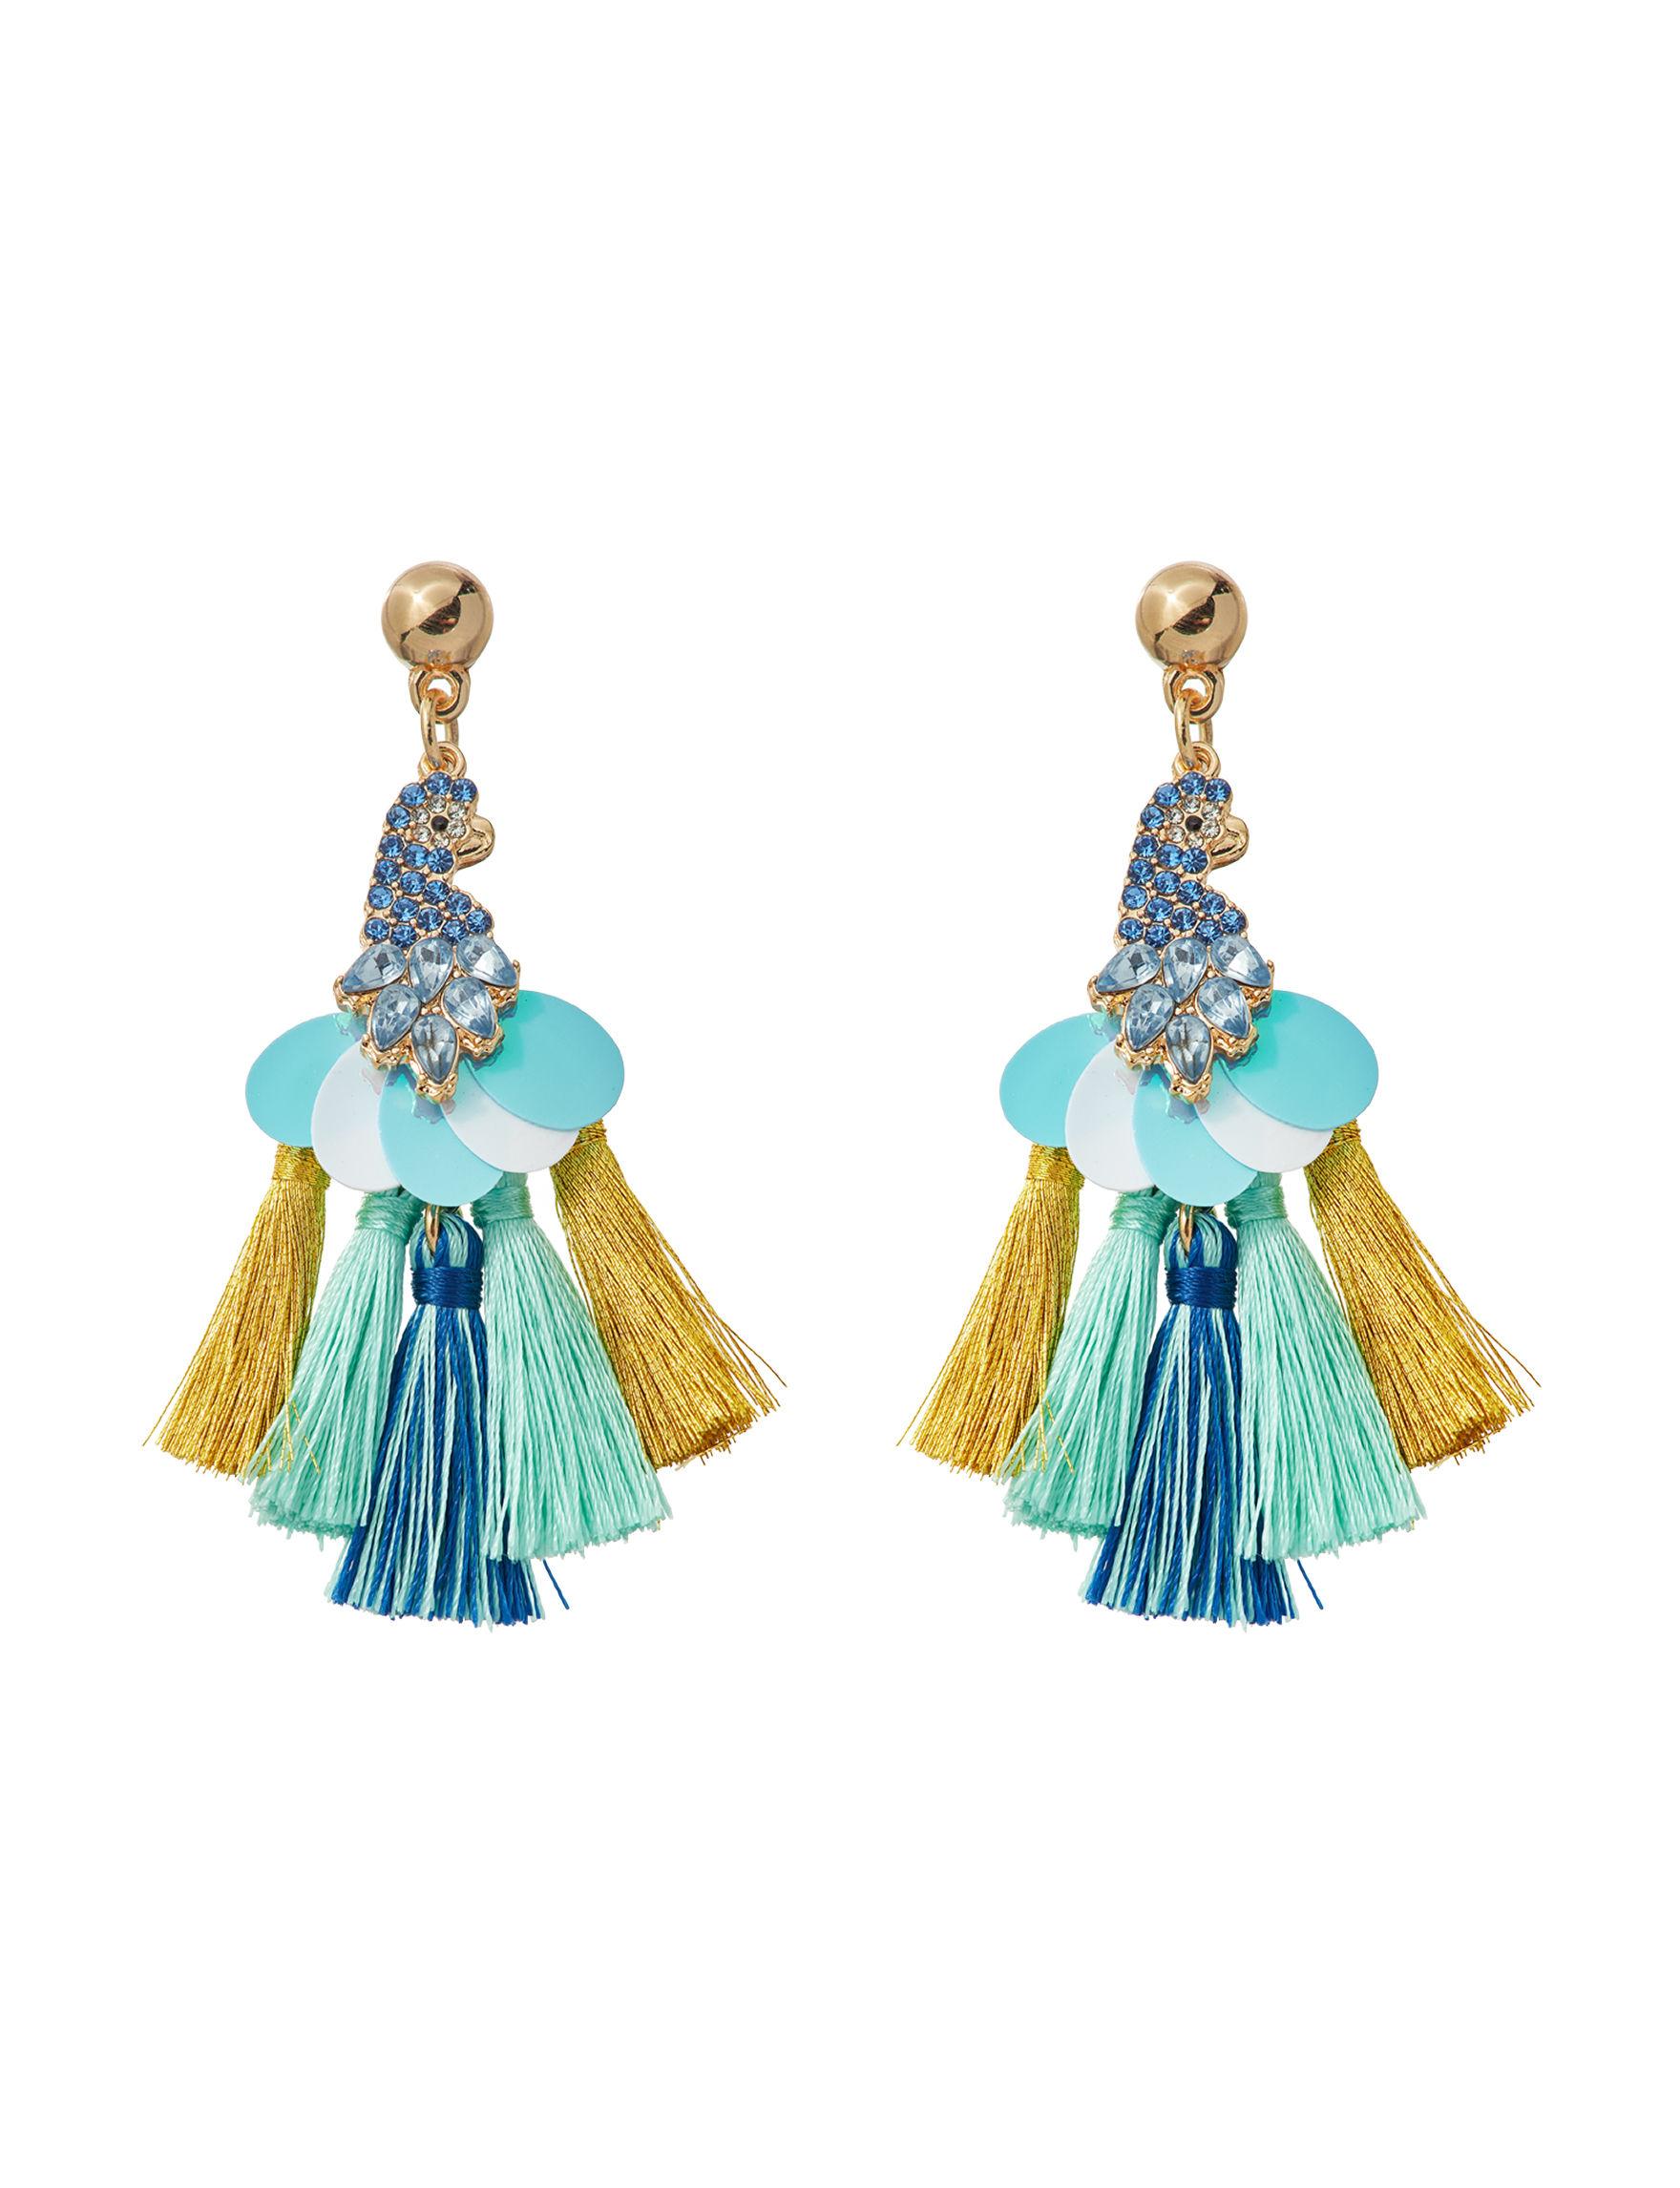 Hannah Blue / Gold Drops Earrings Fashion Jewelry